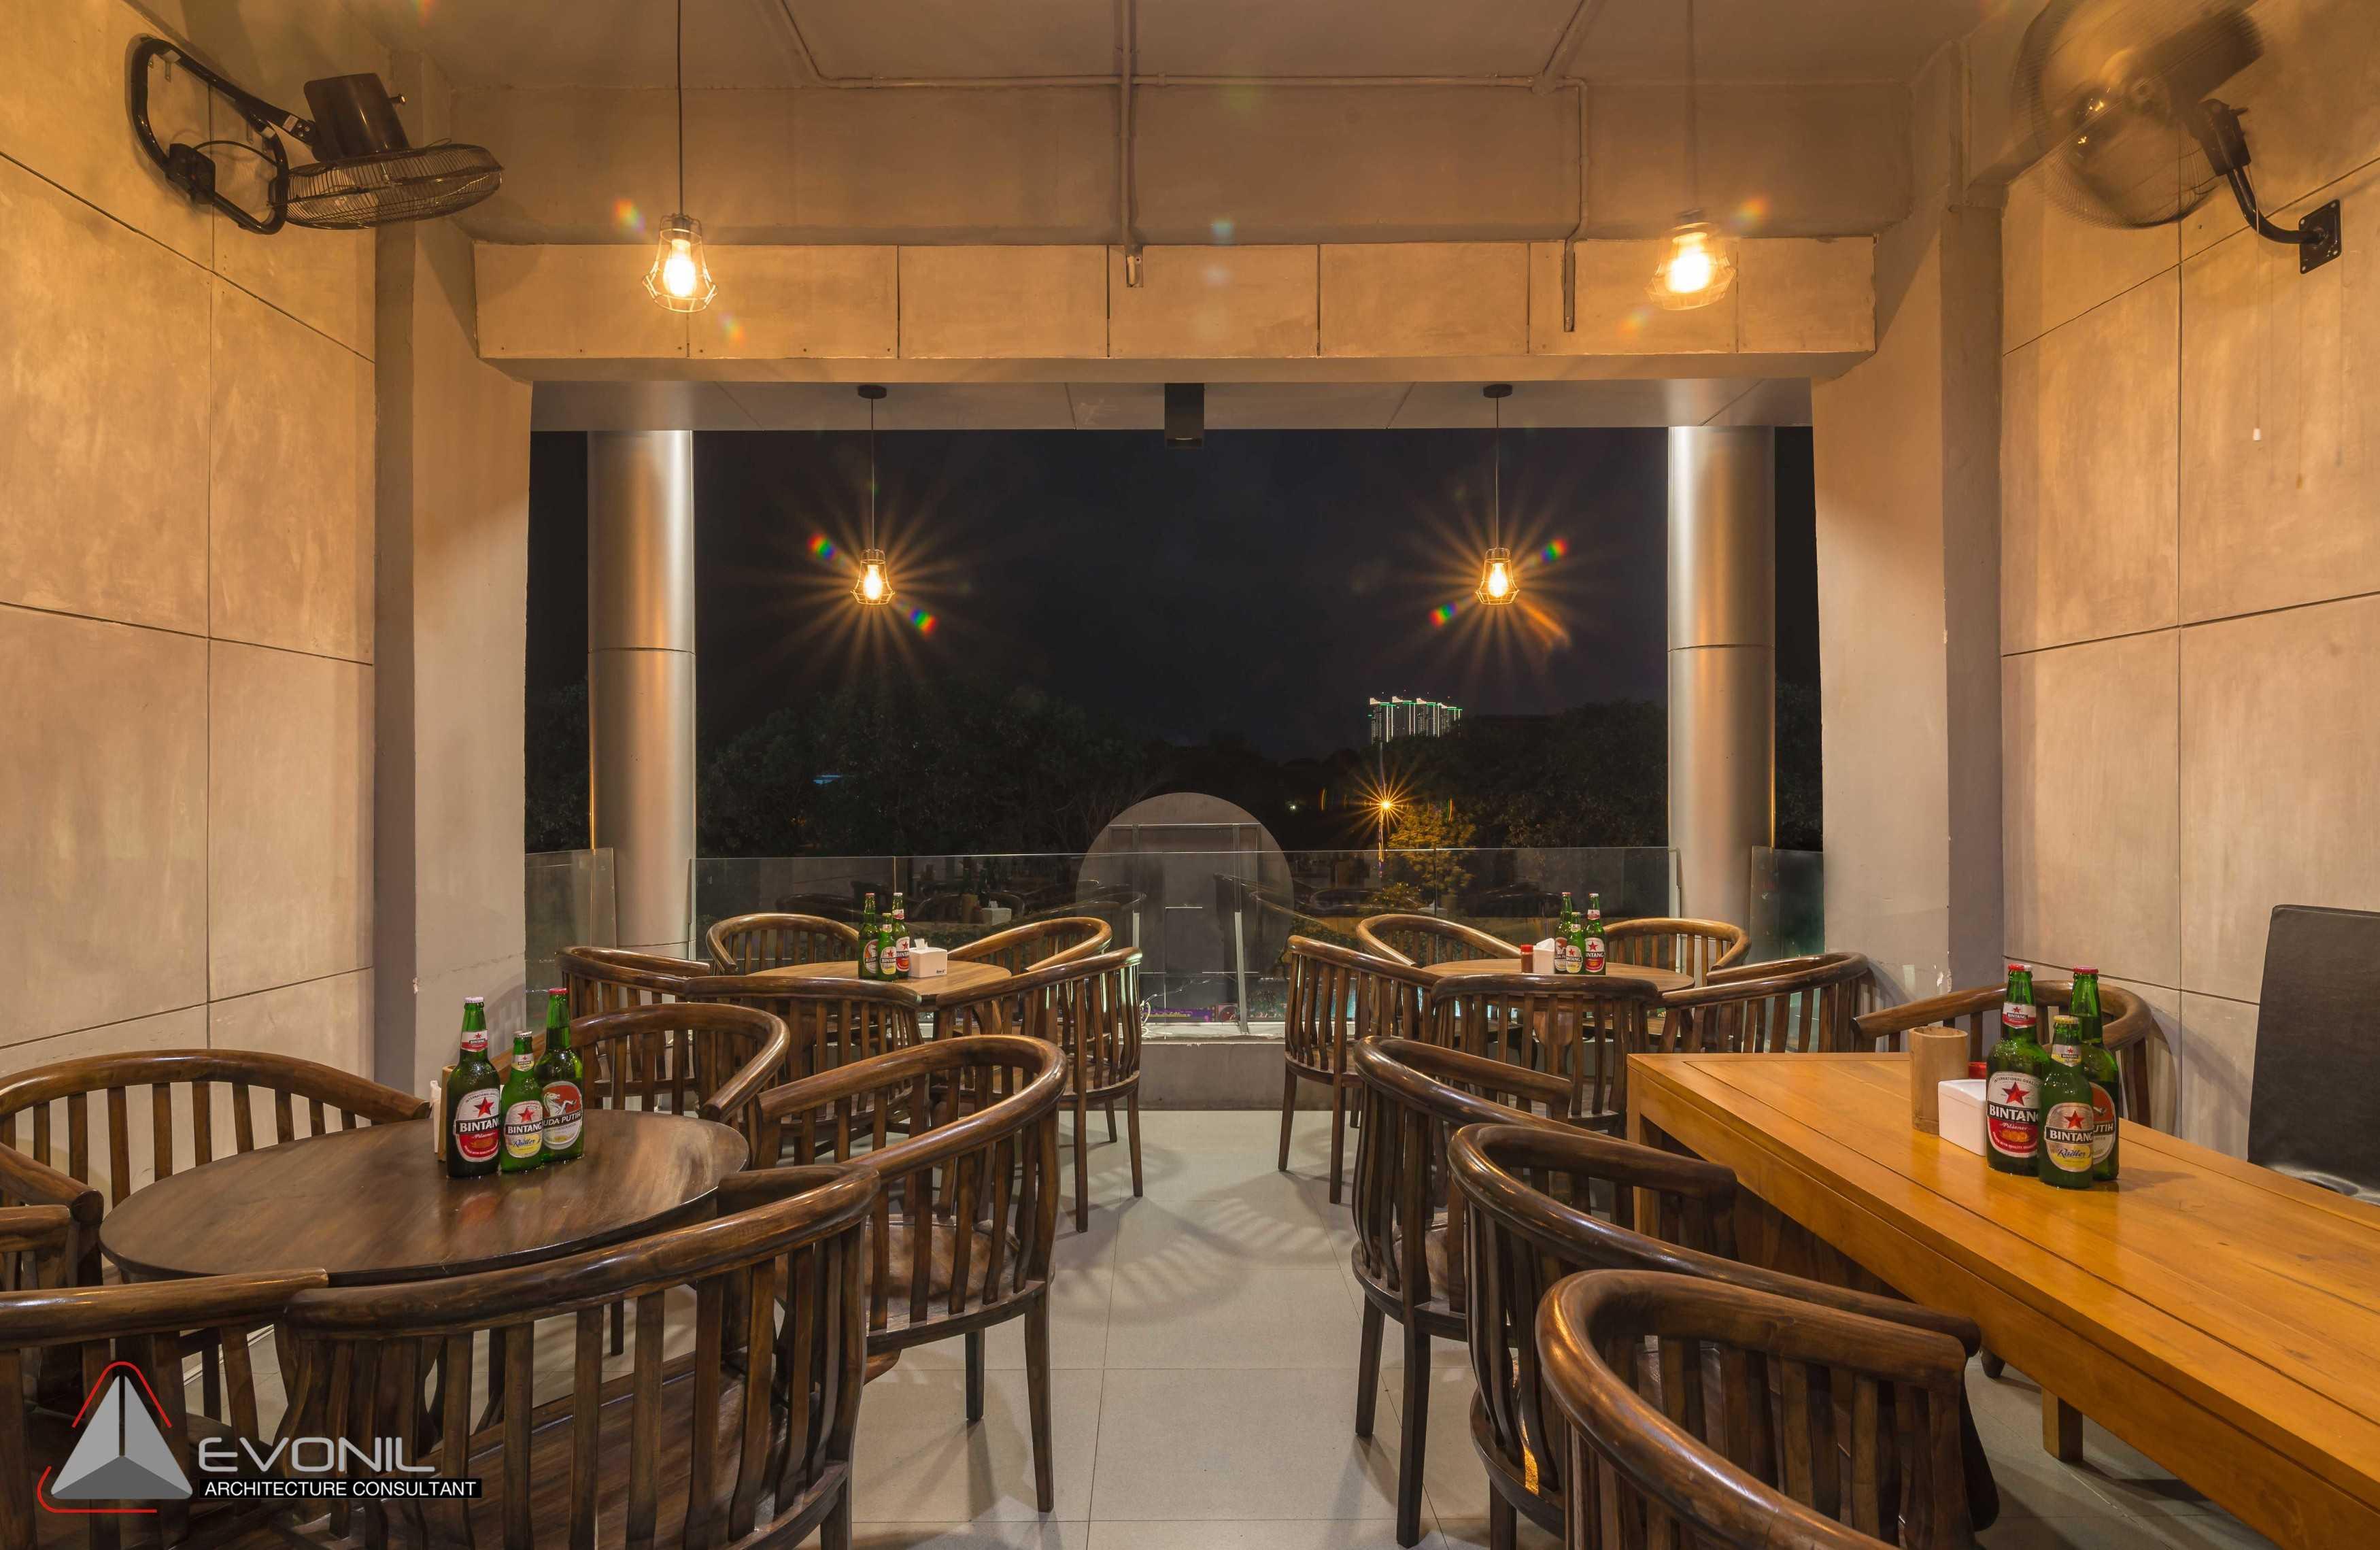 Evonil Architecture Sapeng Art Of Satay Resto P.i.k, Jakarta P.i.k, Jakarta Dining Area Modern  13186